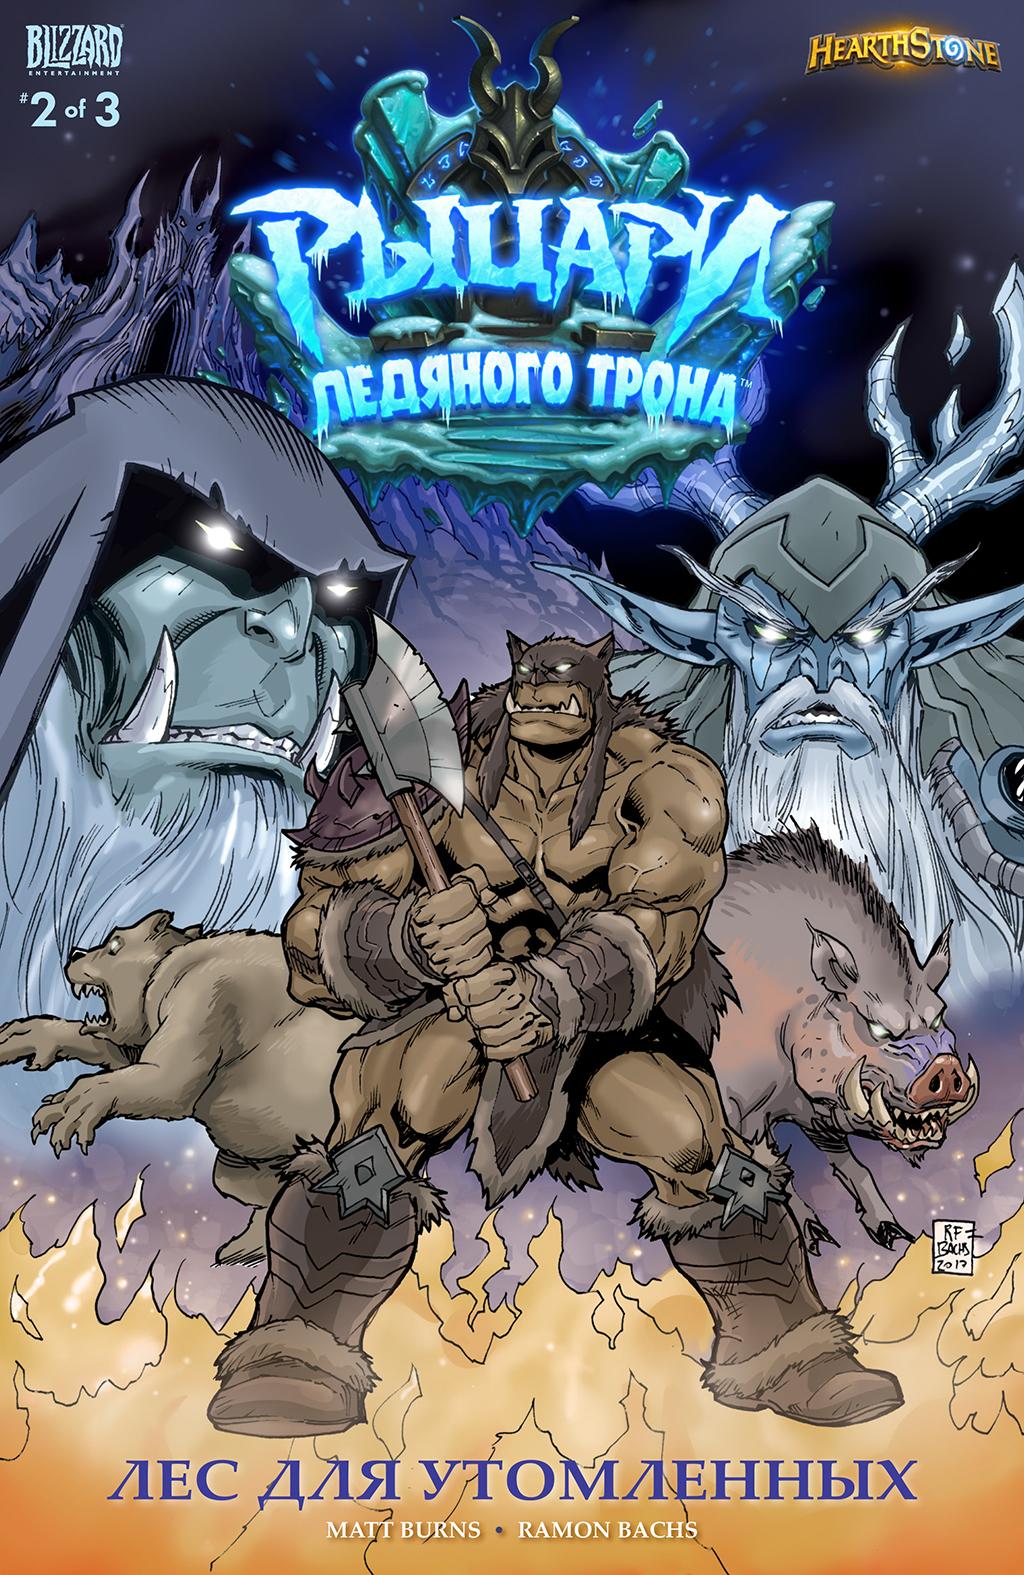 Комикс HearthStone Рыцари Ледяного Трона